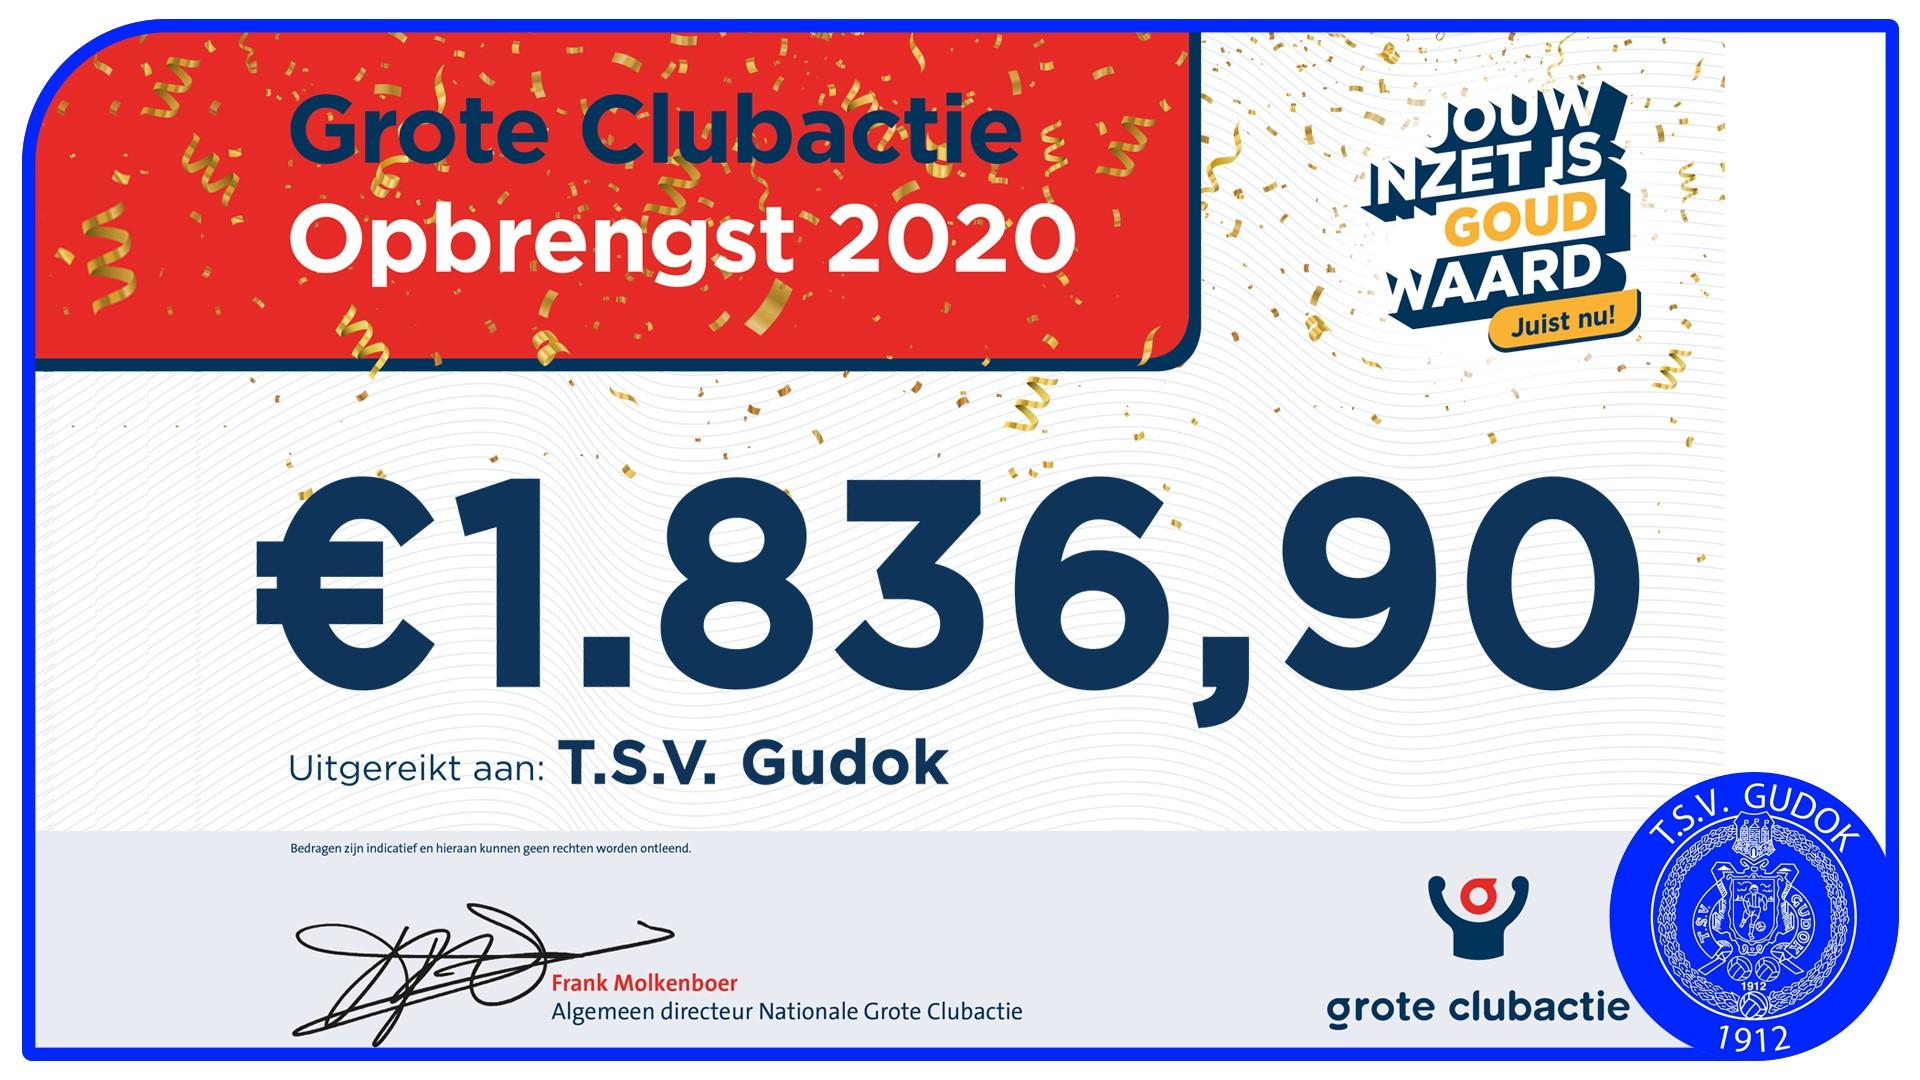 Grote Clubactie Opbrengst 2020!!!